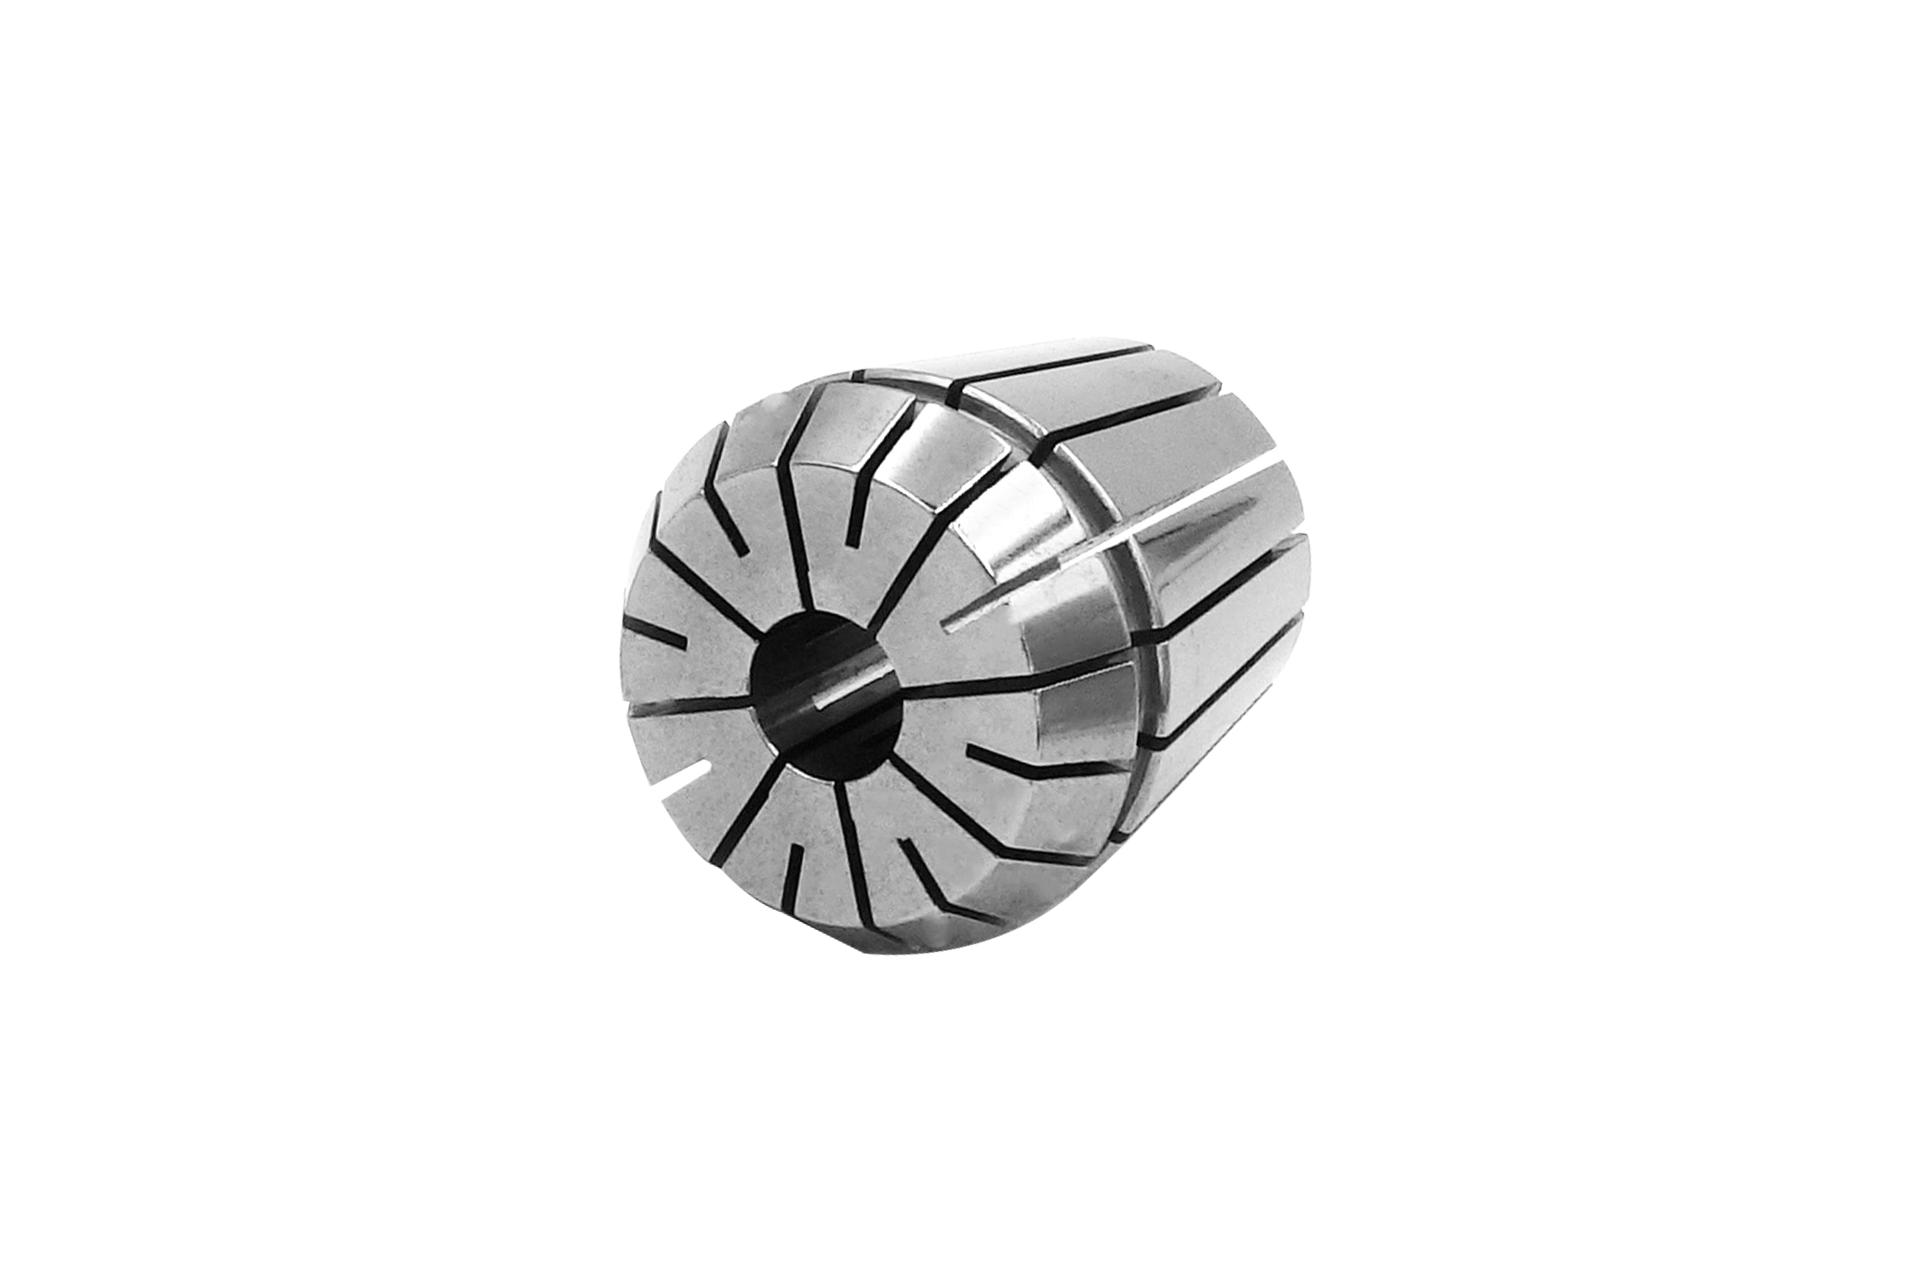 PAULIMOT ER40-Pr/äzisions-Spannzange 12-11 mm nach DIN 6499